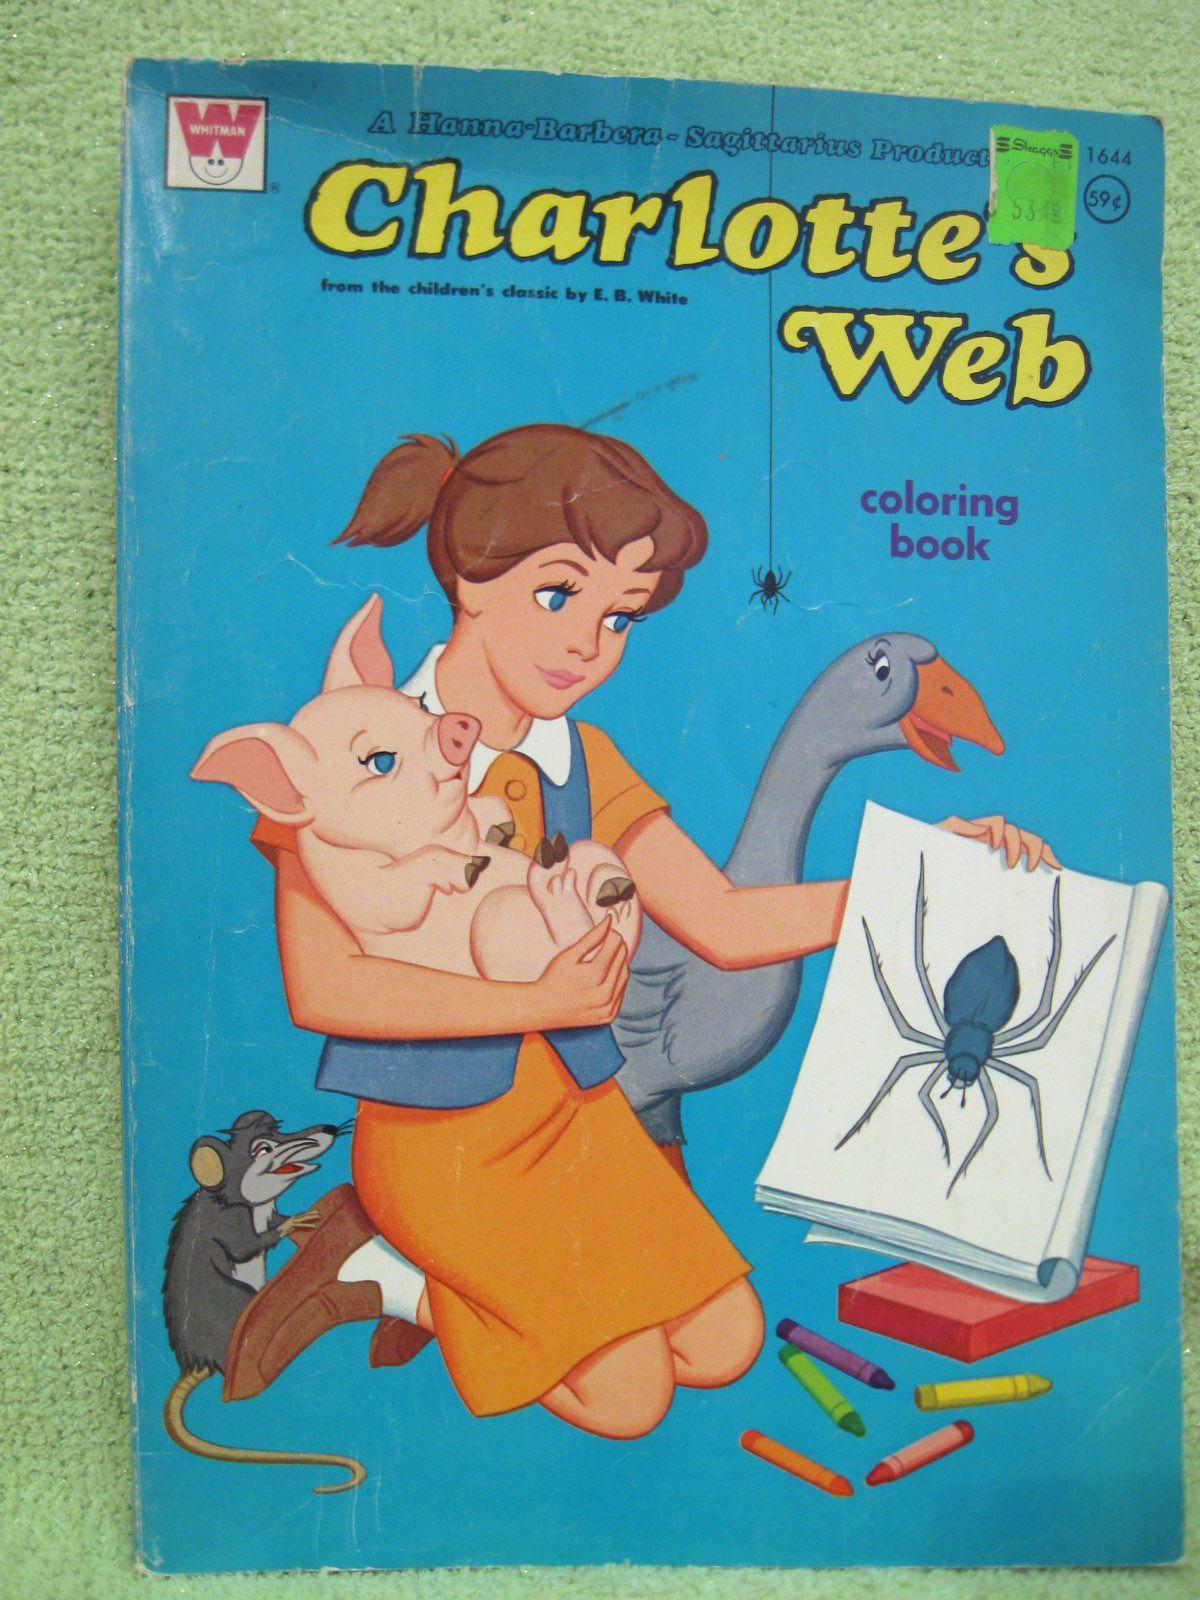 Charlottes Web Vintage Coloring Book 1973 Hanna Barbera Movie Cartoon Original